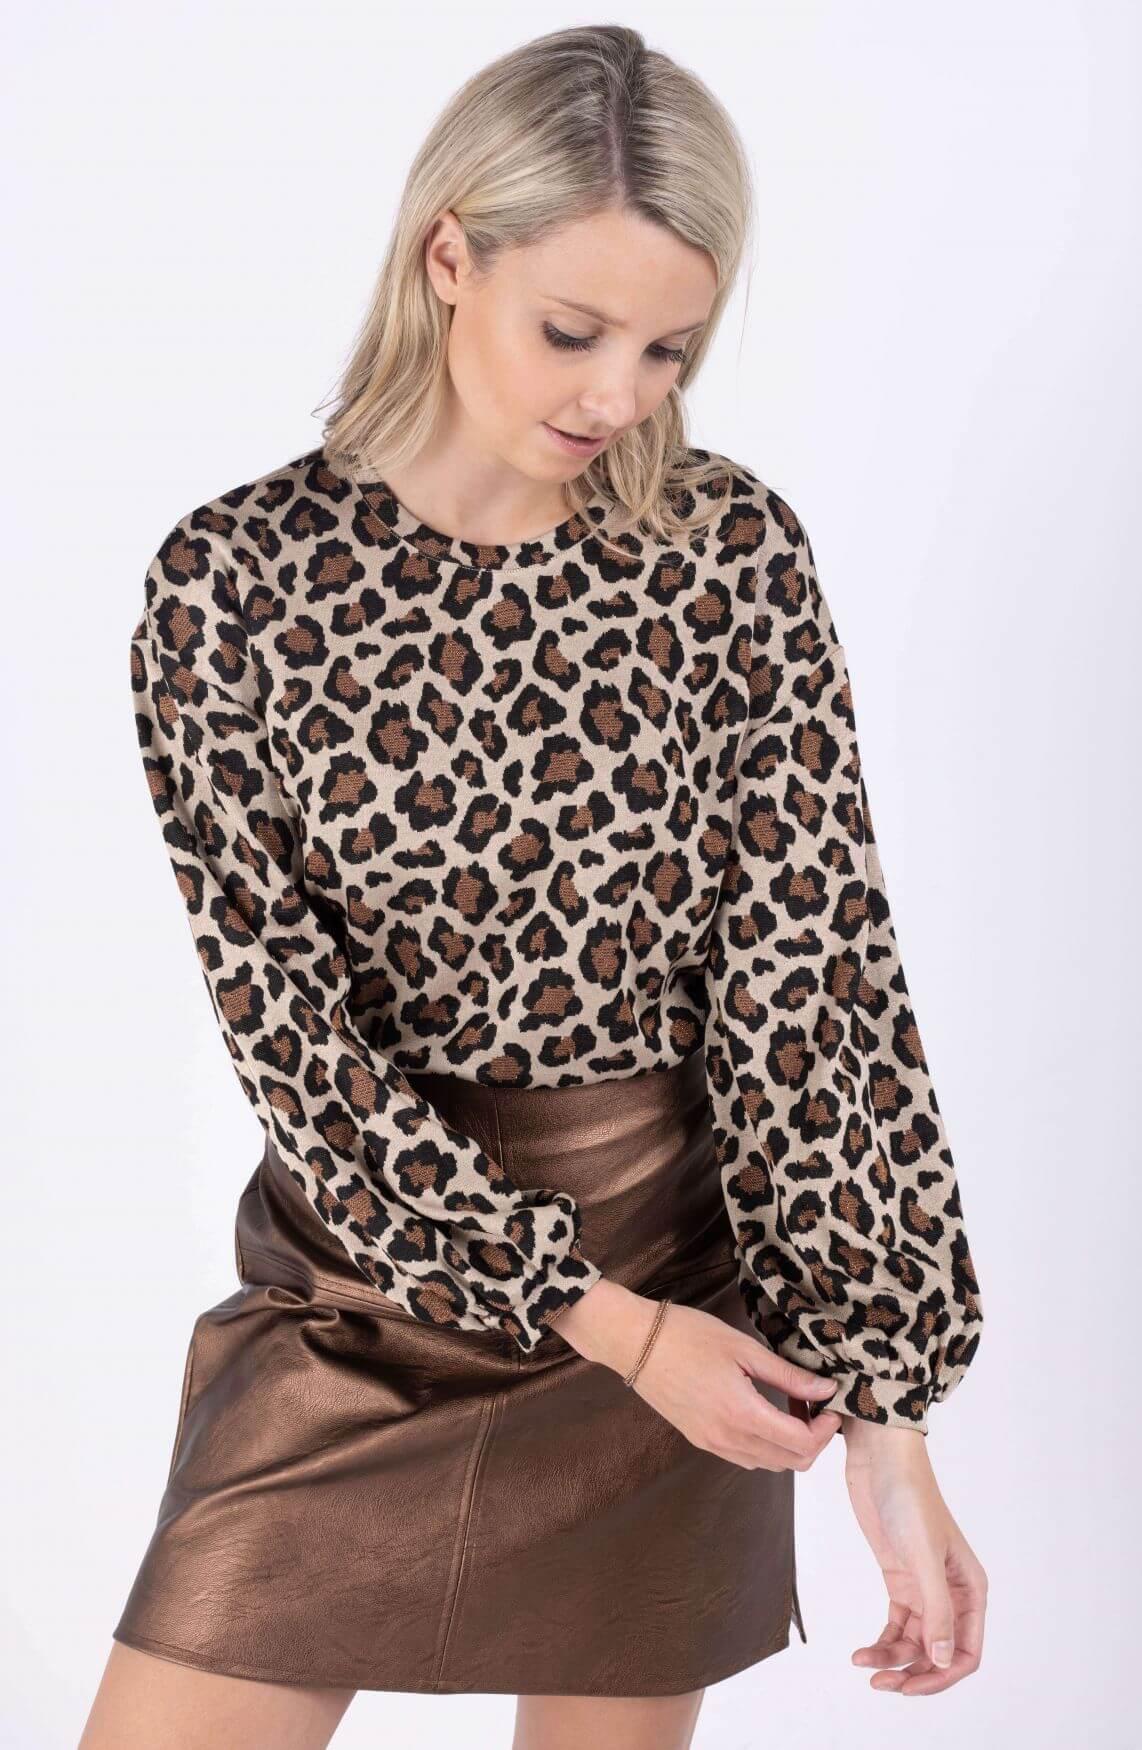 Anna Dames Sweater met panterprint Bruin